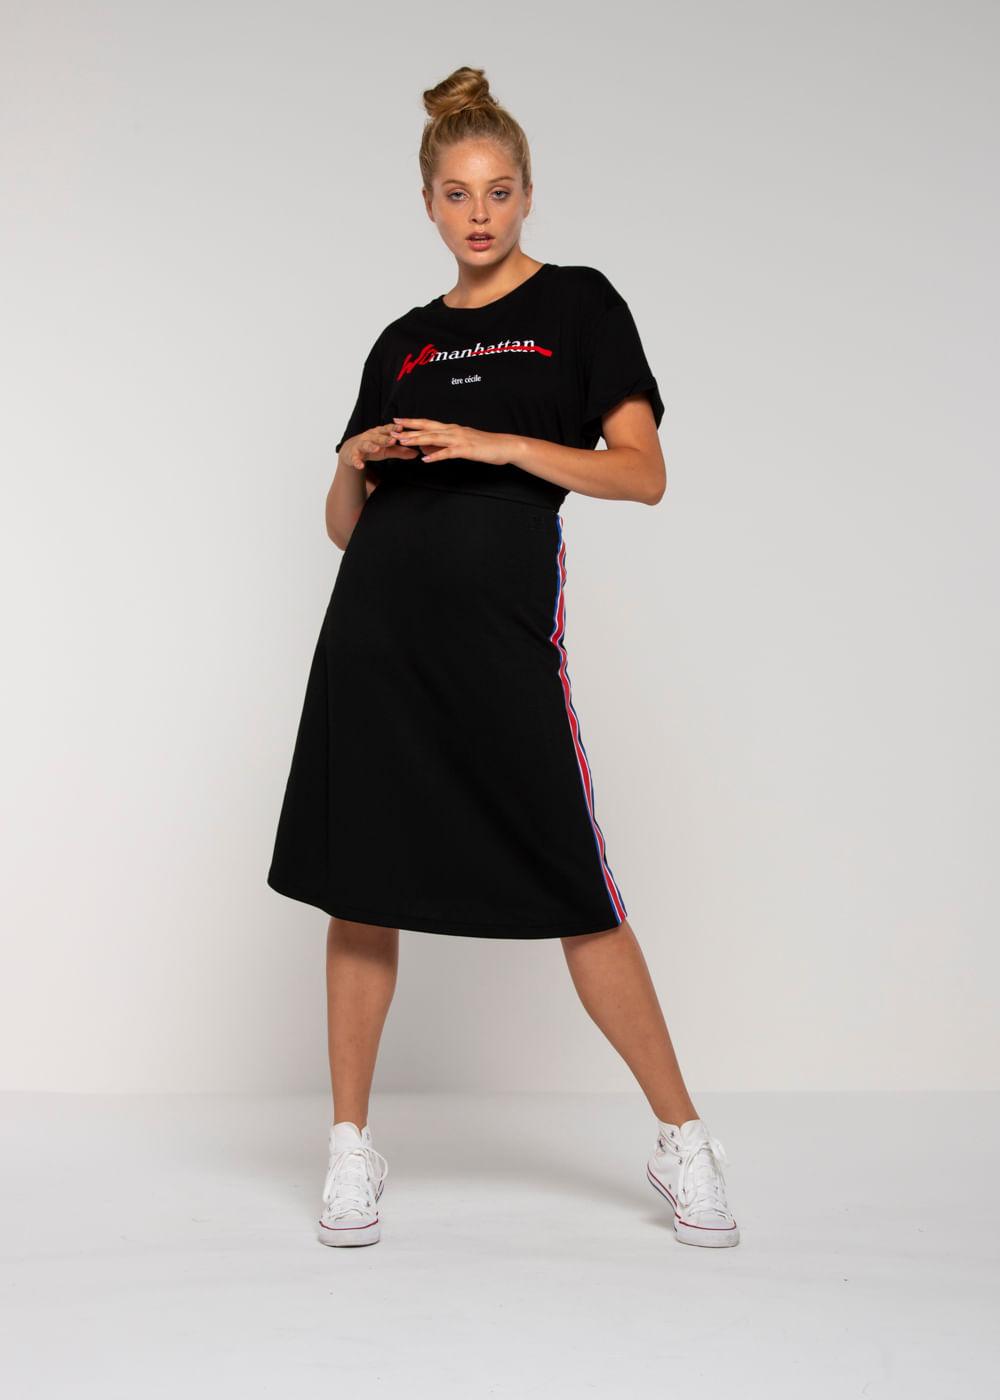 Camiseta Woman Oversized Preta Pp